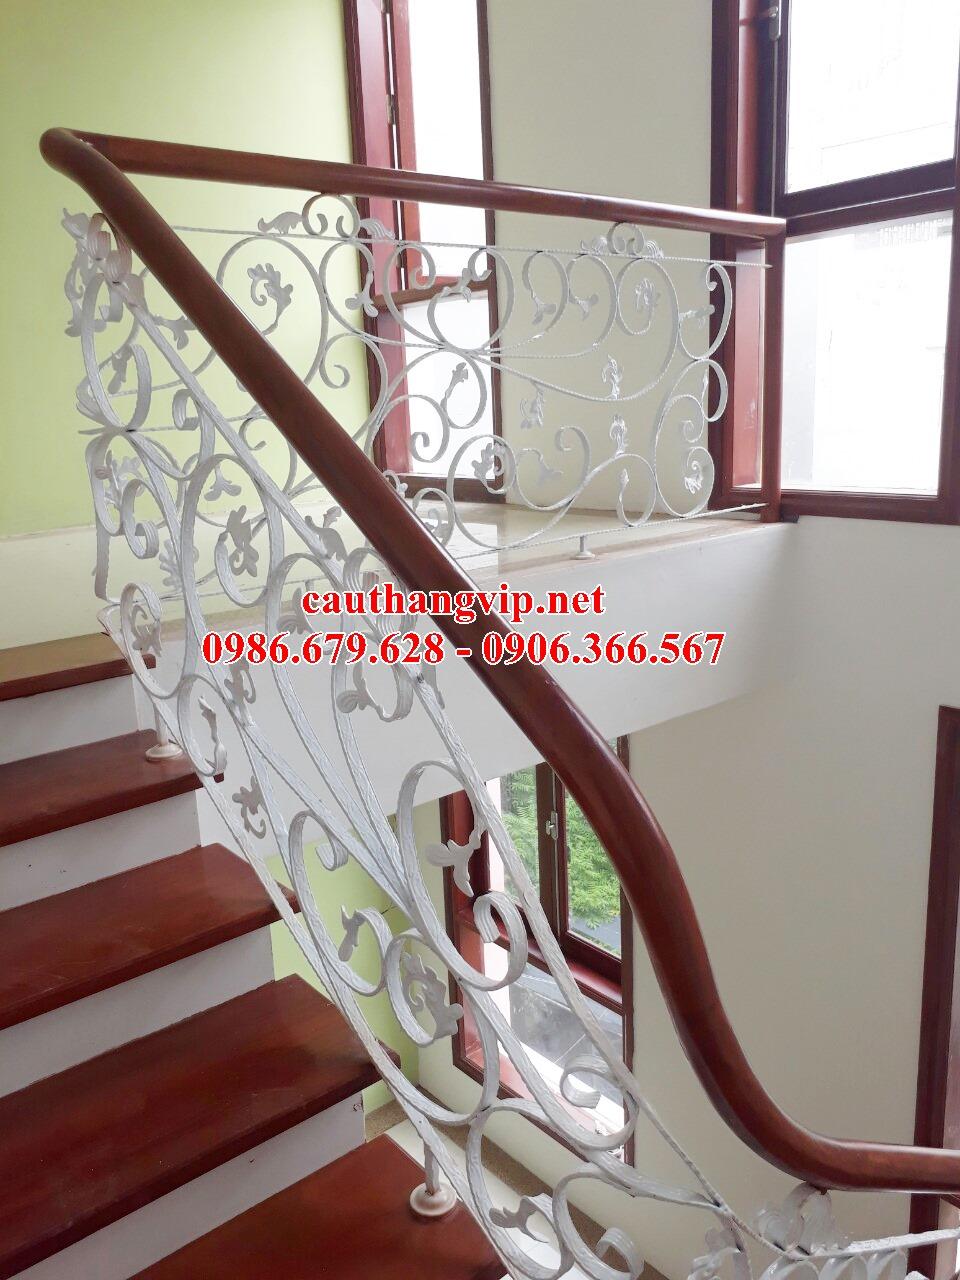 sat NT Cauthangvip.net2